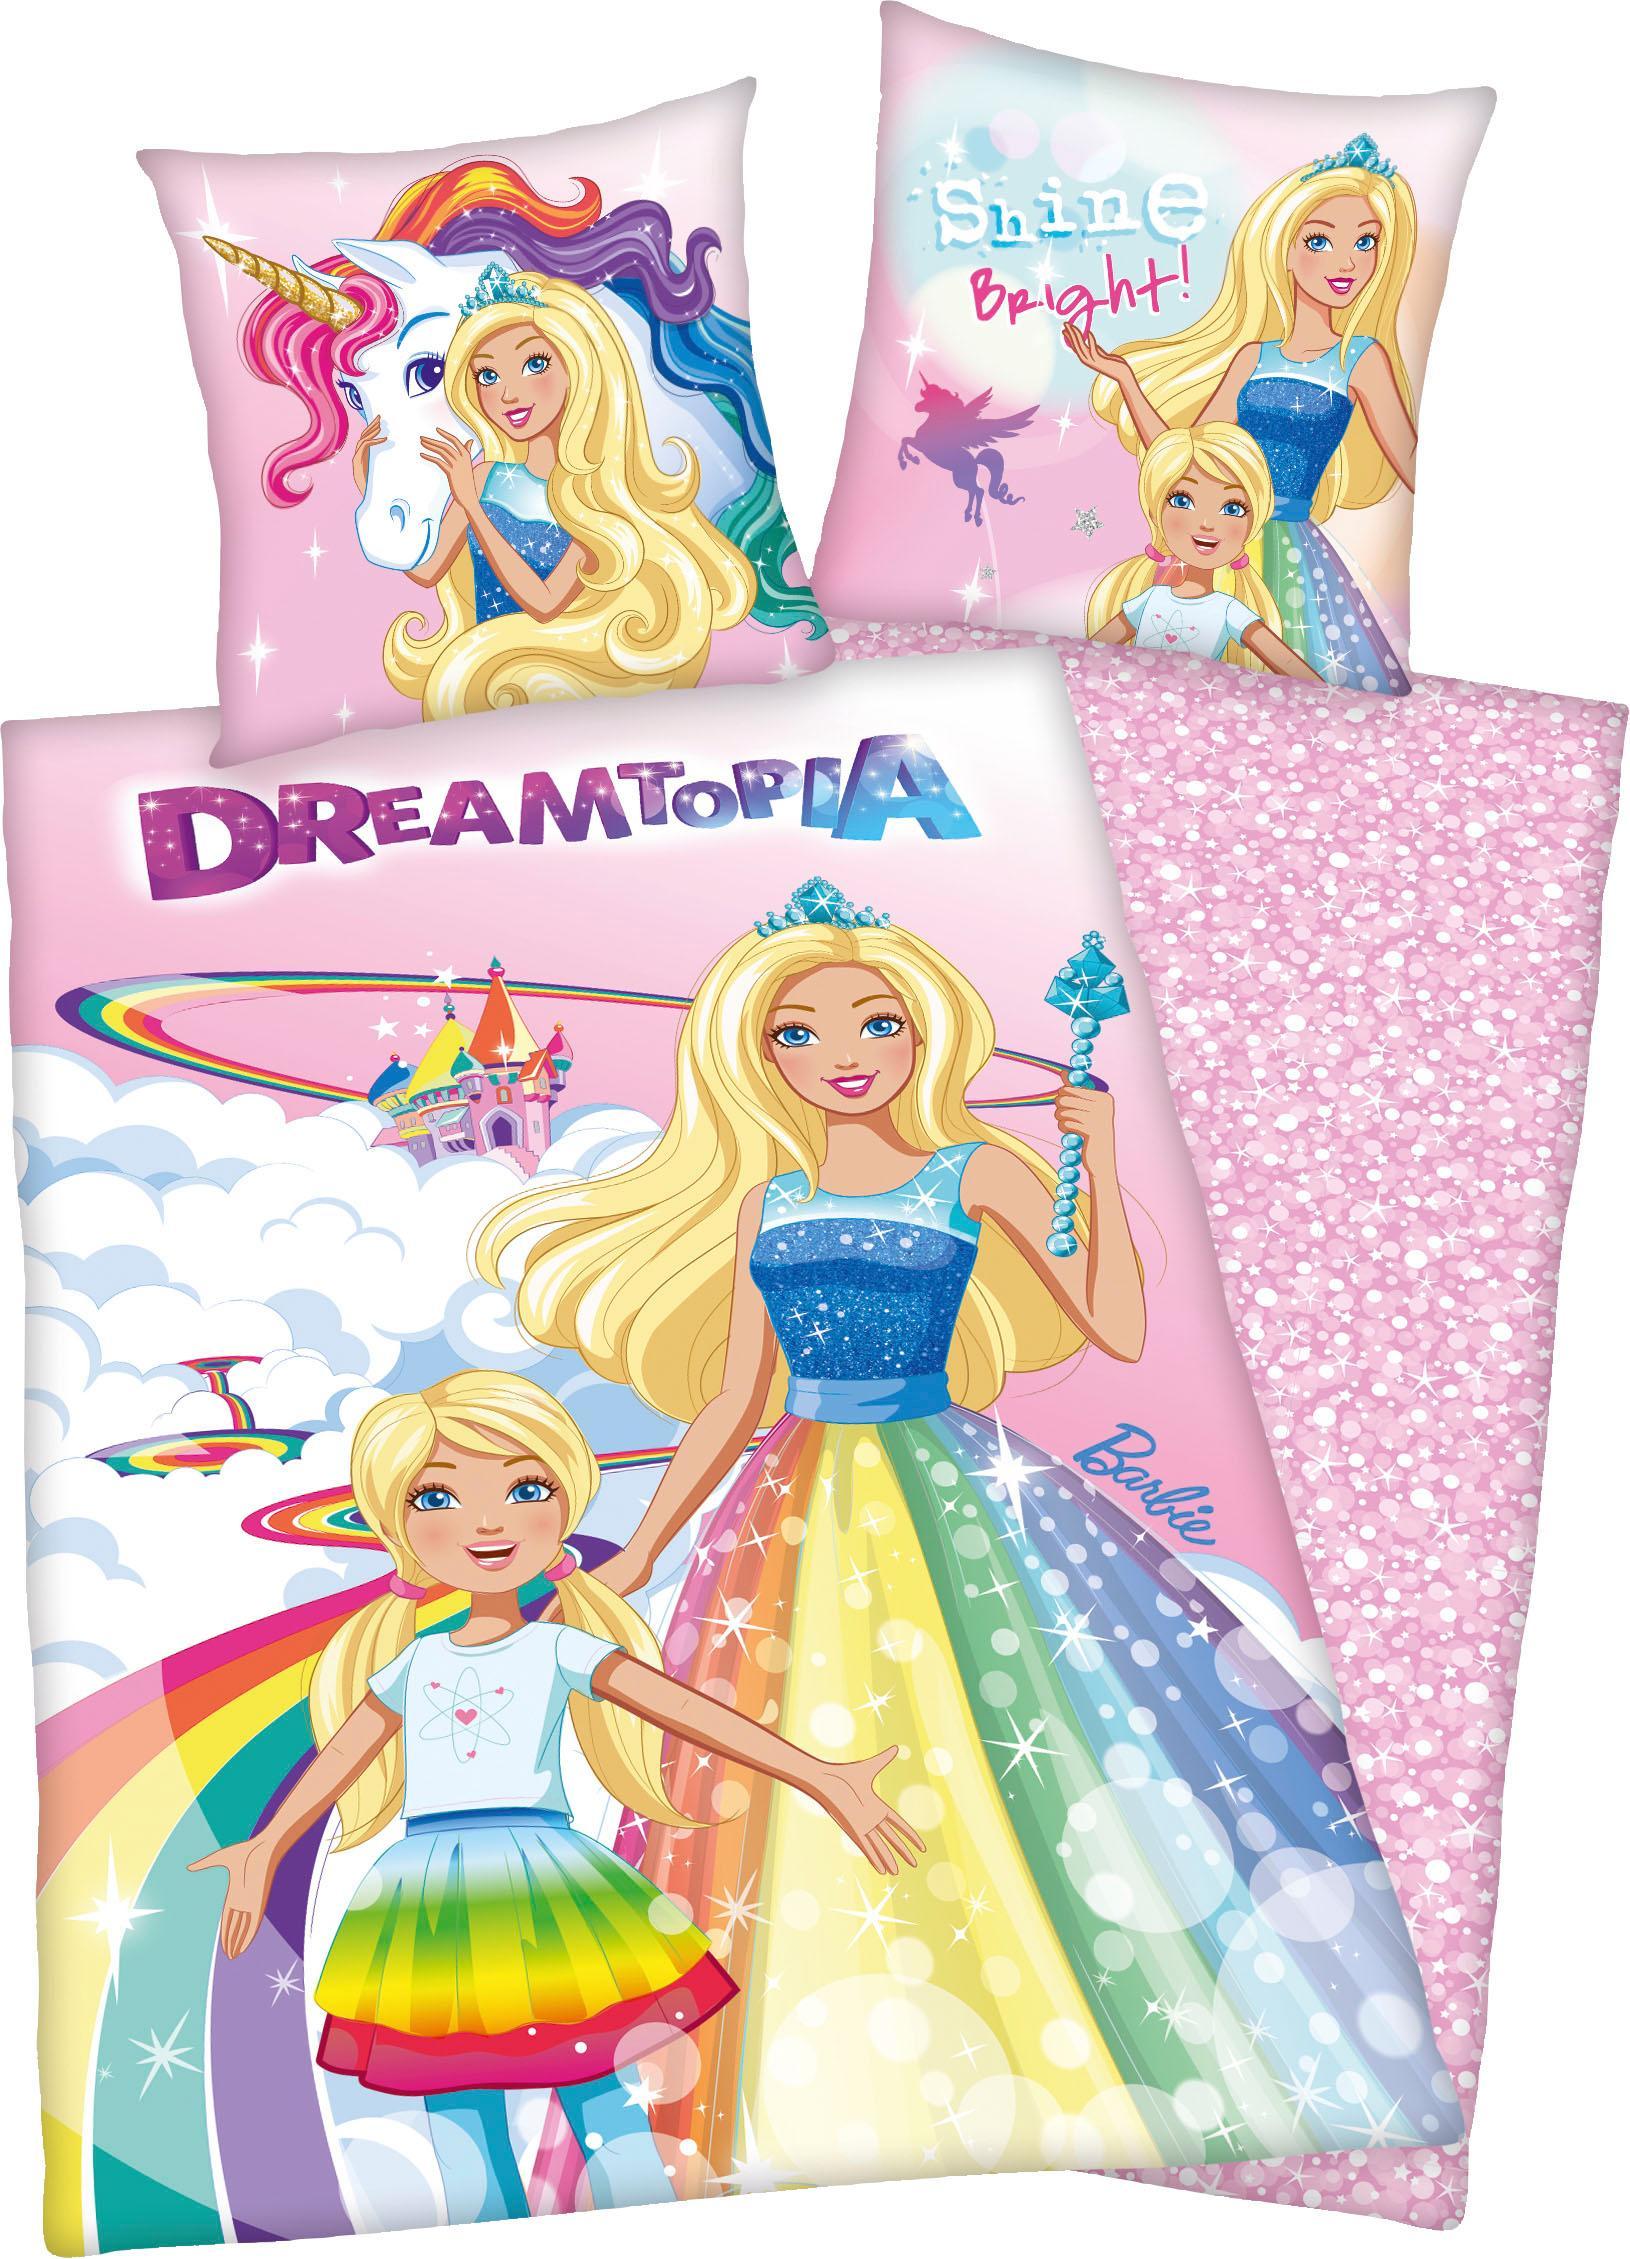 Kinderbettwäsche Barbie Dreamtopia Mattel | Kinderzimmer > Textilien für Kinder > Kinderbettwäsche | Rosa | Mattel